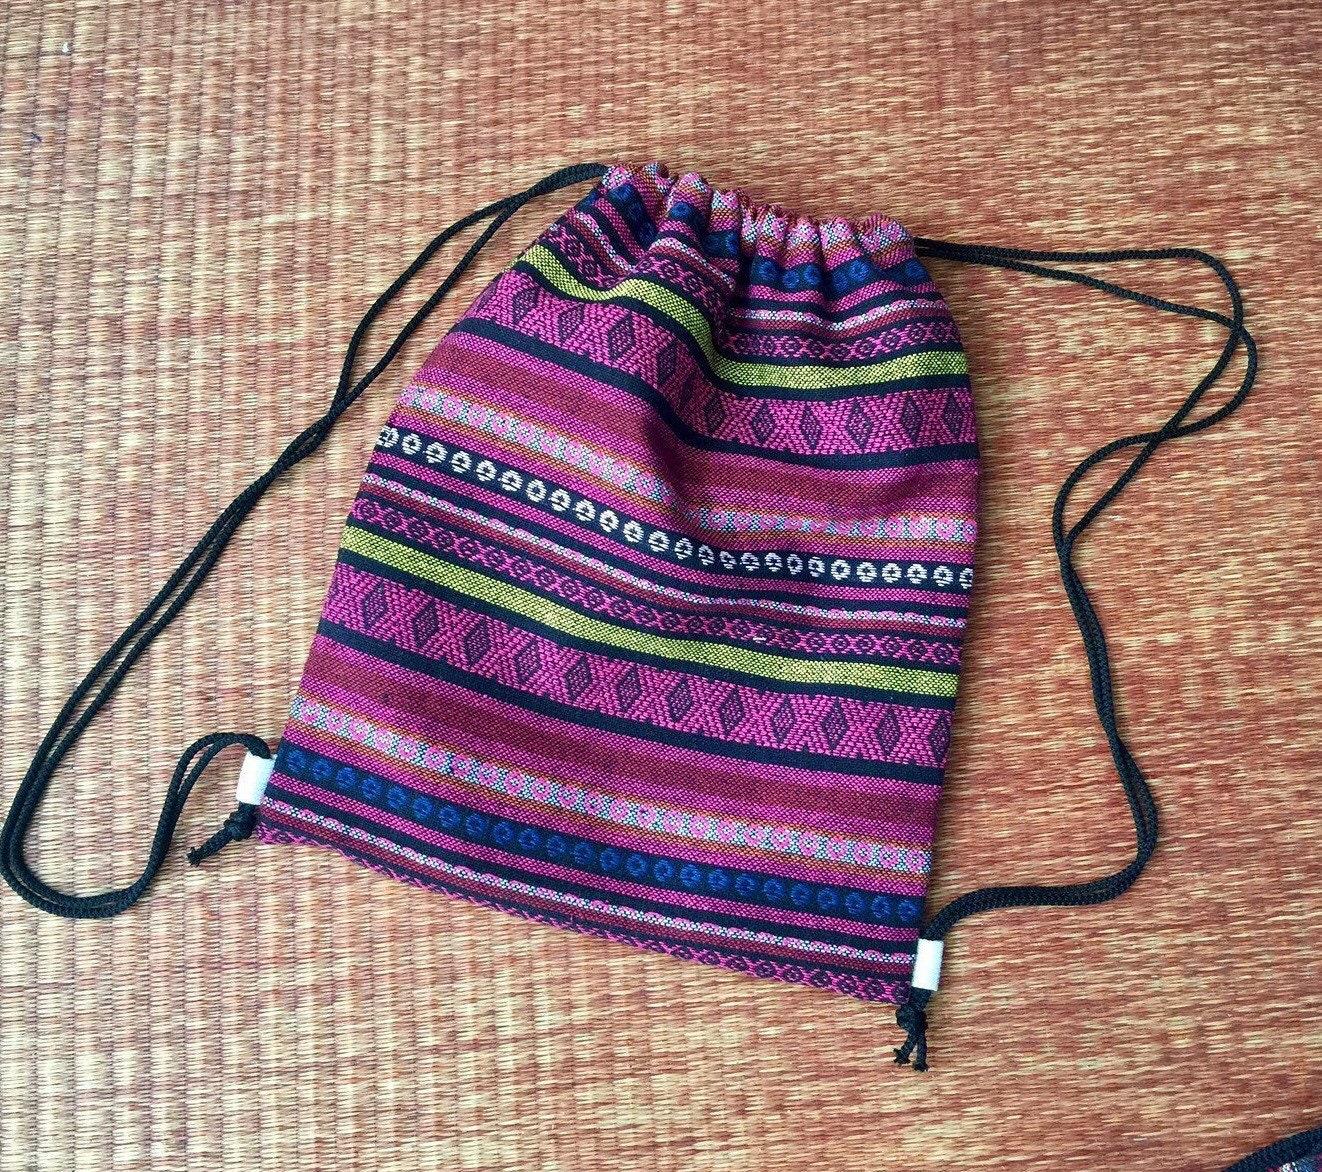 46d0488e9e62 Drawstring backpack Boho Tribal Festival bag Folk Aztec Ikat Woven fabric  Hippie Style Rucksack Gypsy Tote Bohemian Men Hipster Native Black